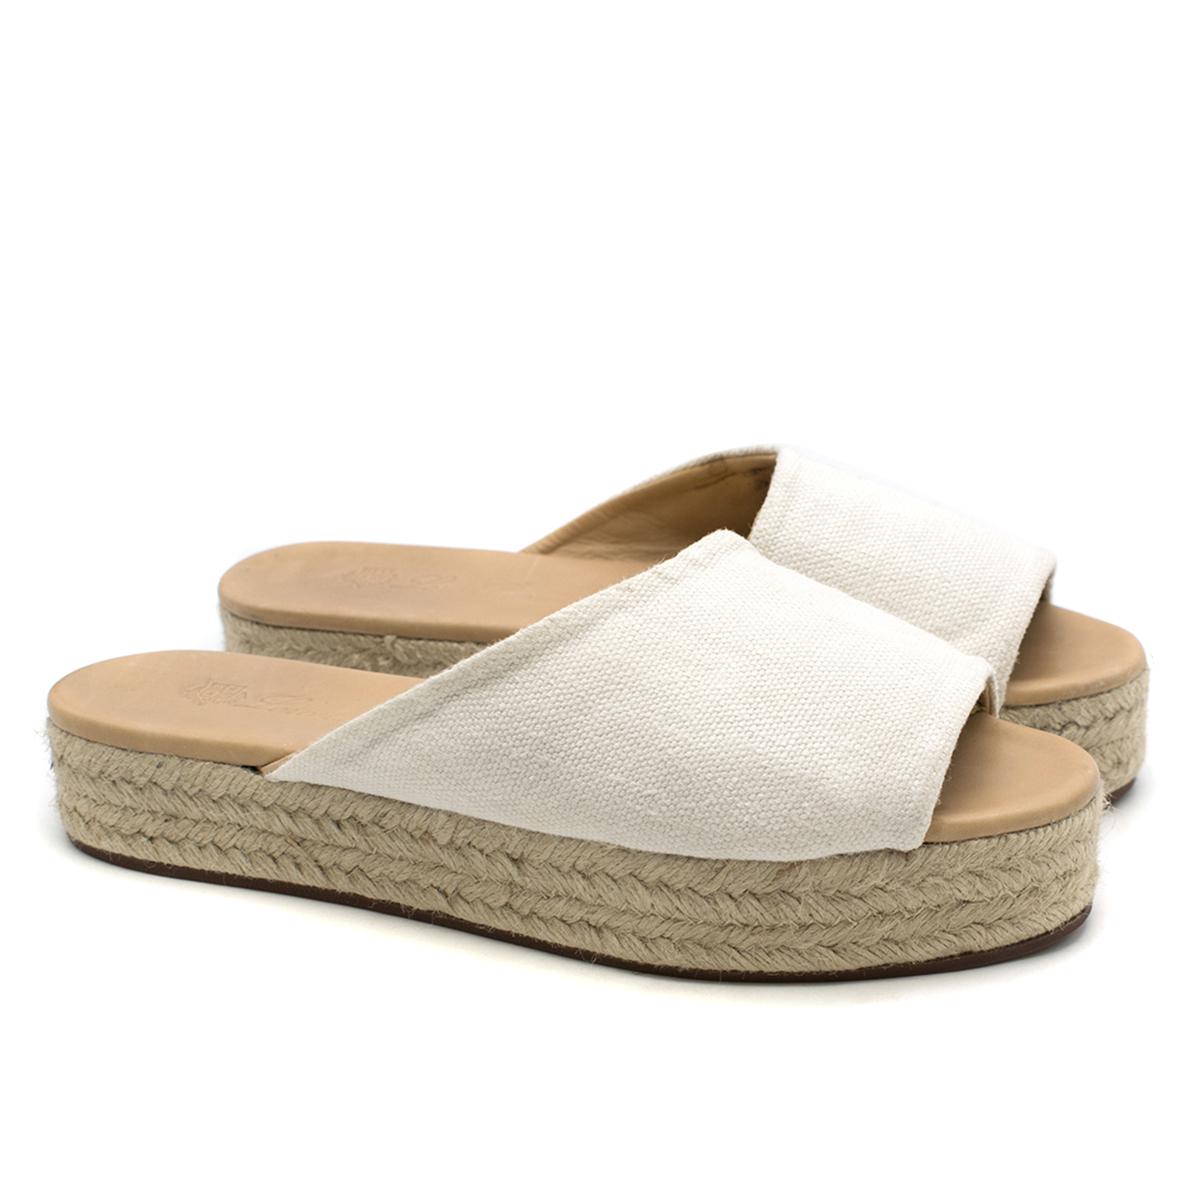 Loro Piana canvas platform sandals